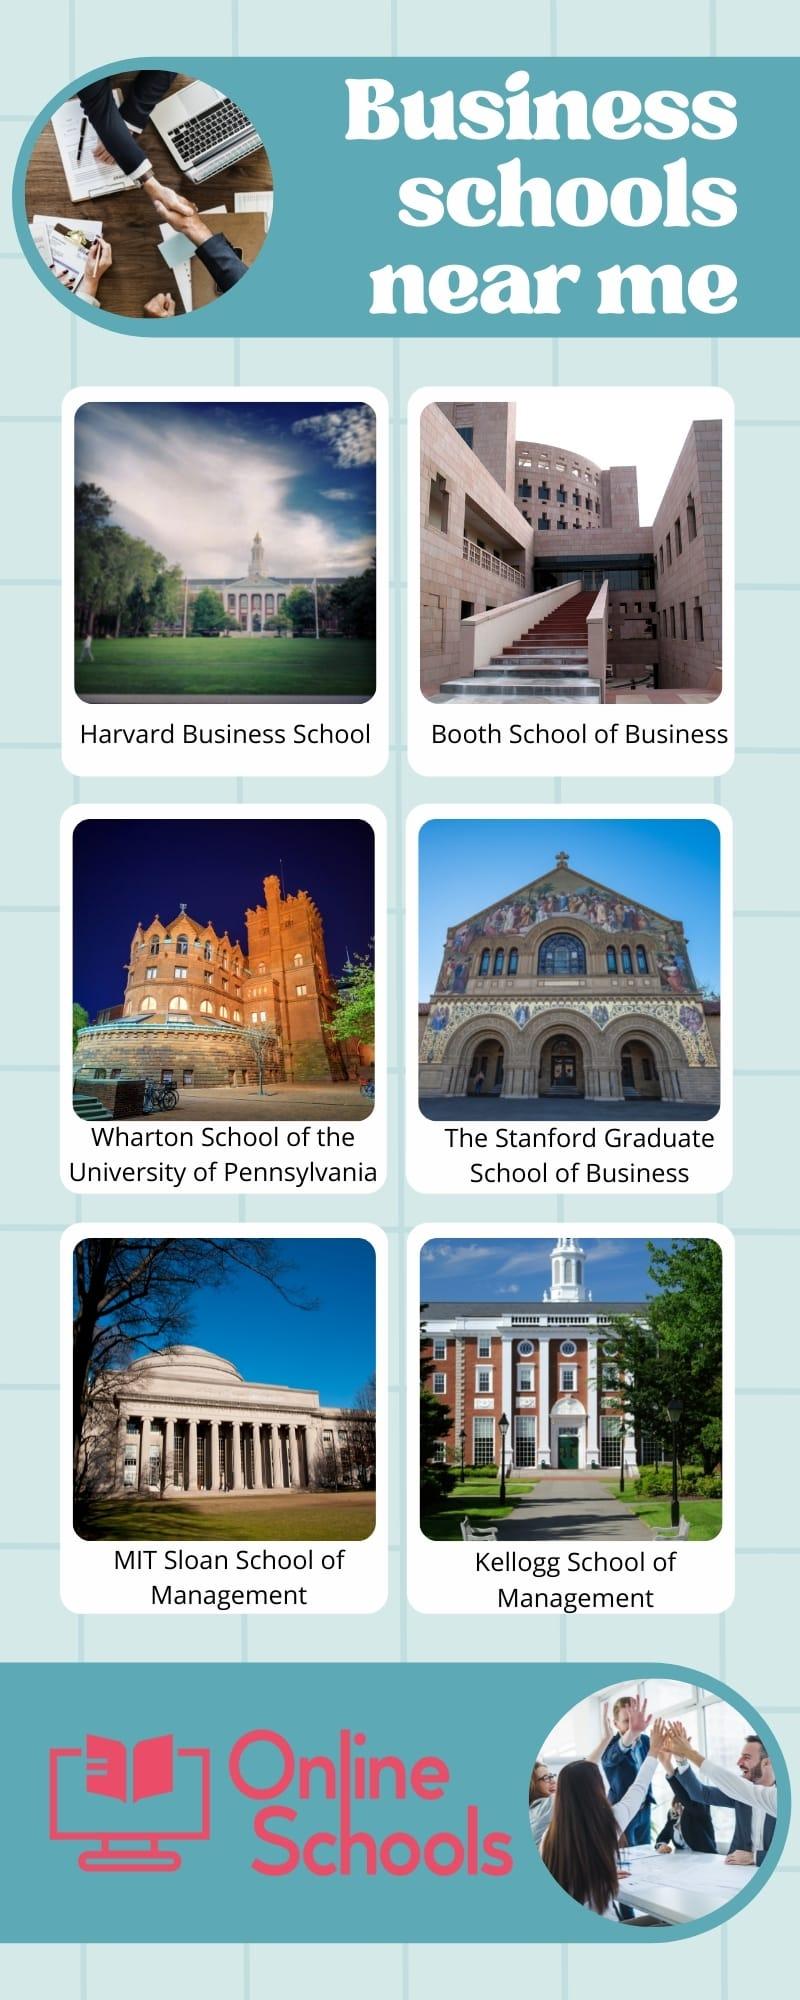 Business schools near me